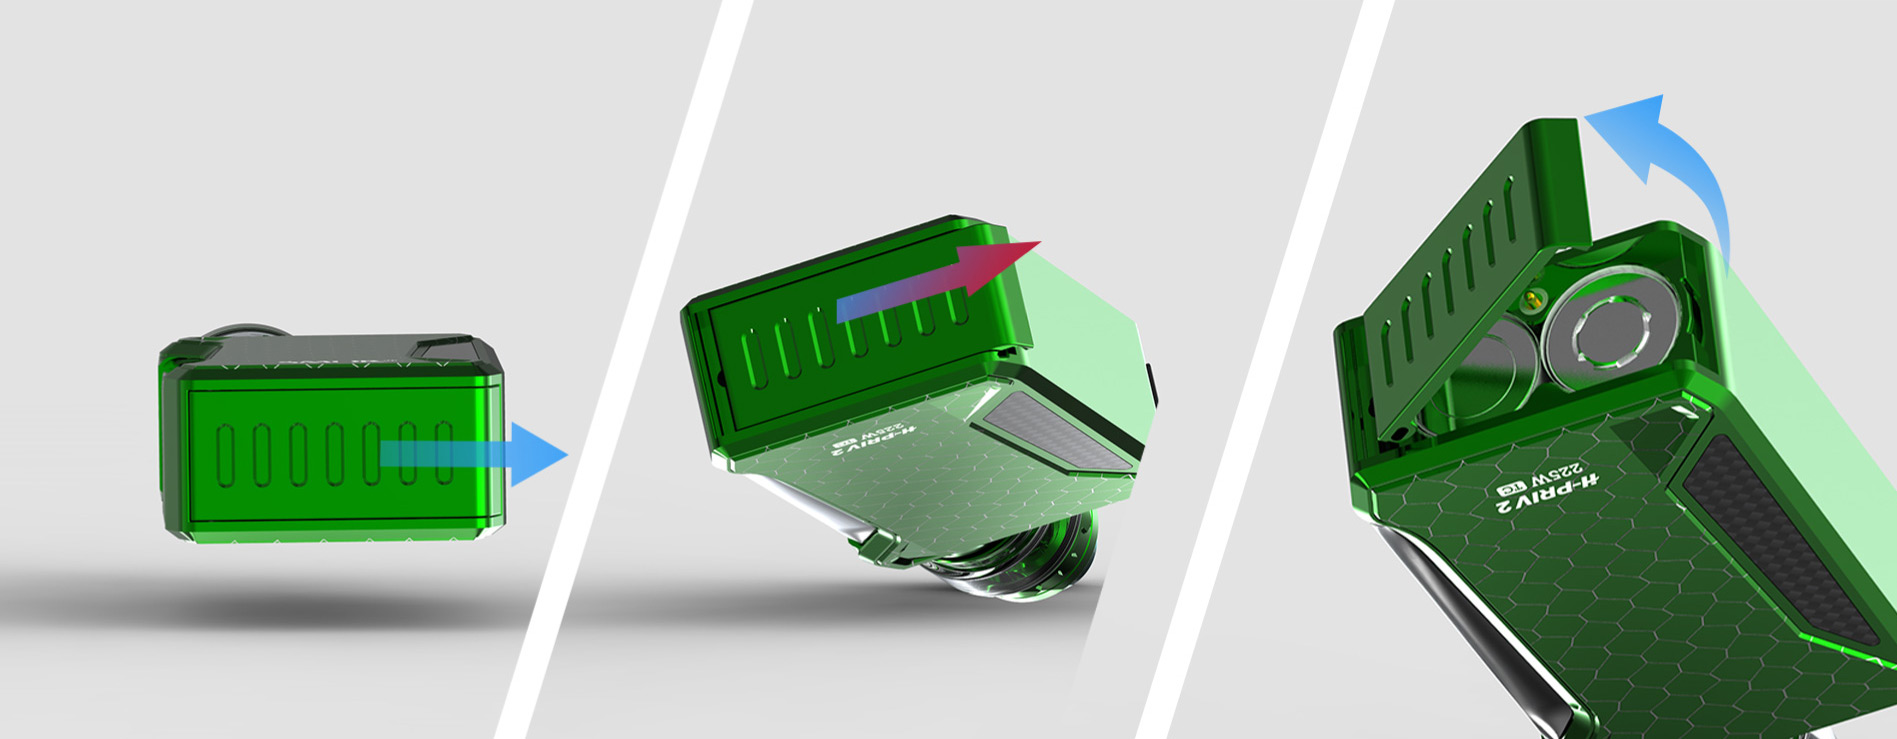 smok-smoktech-hpriv-2-tc225w-grip-full-kit-ulozeni-baterie